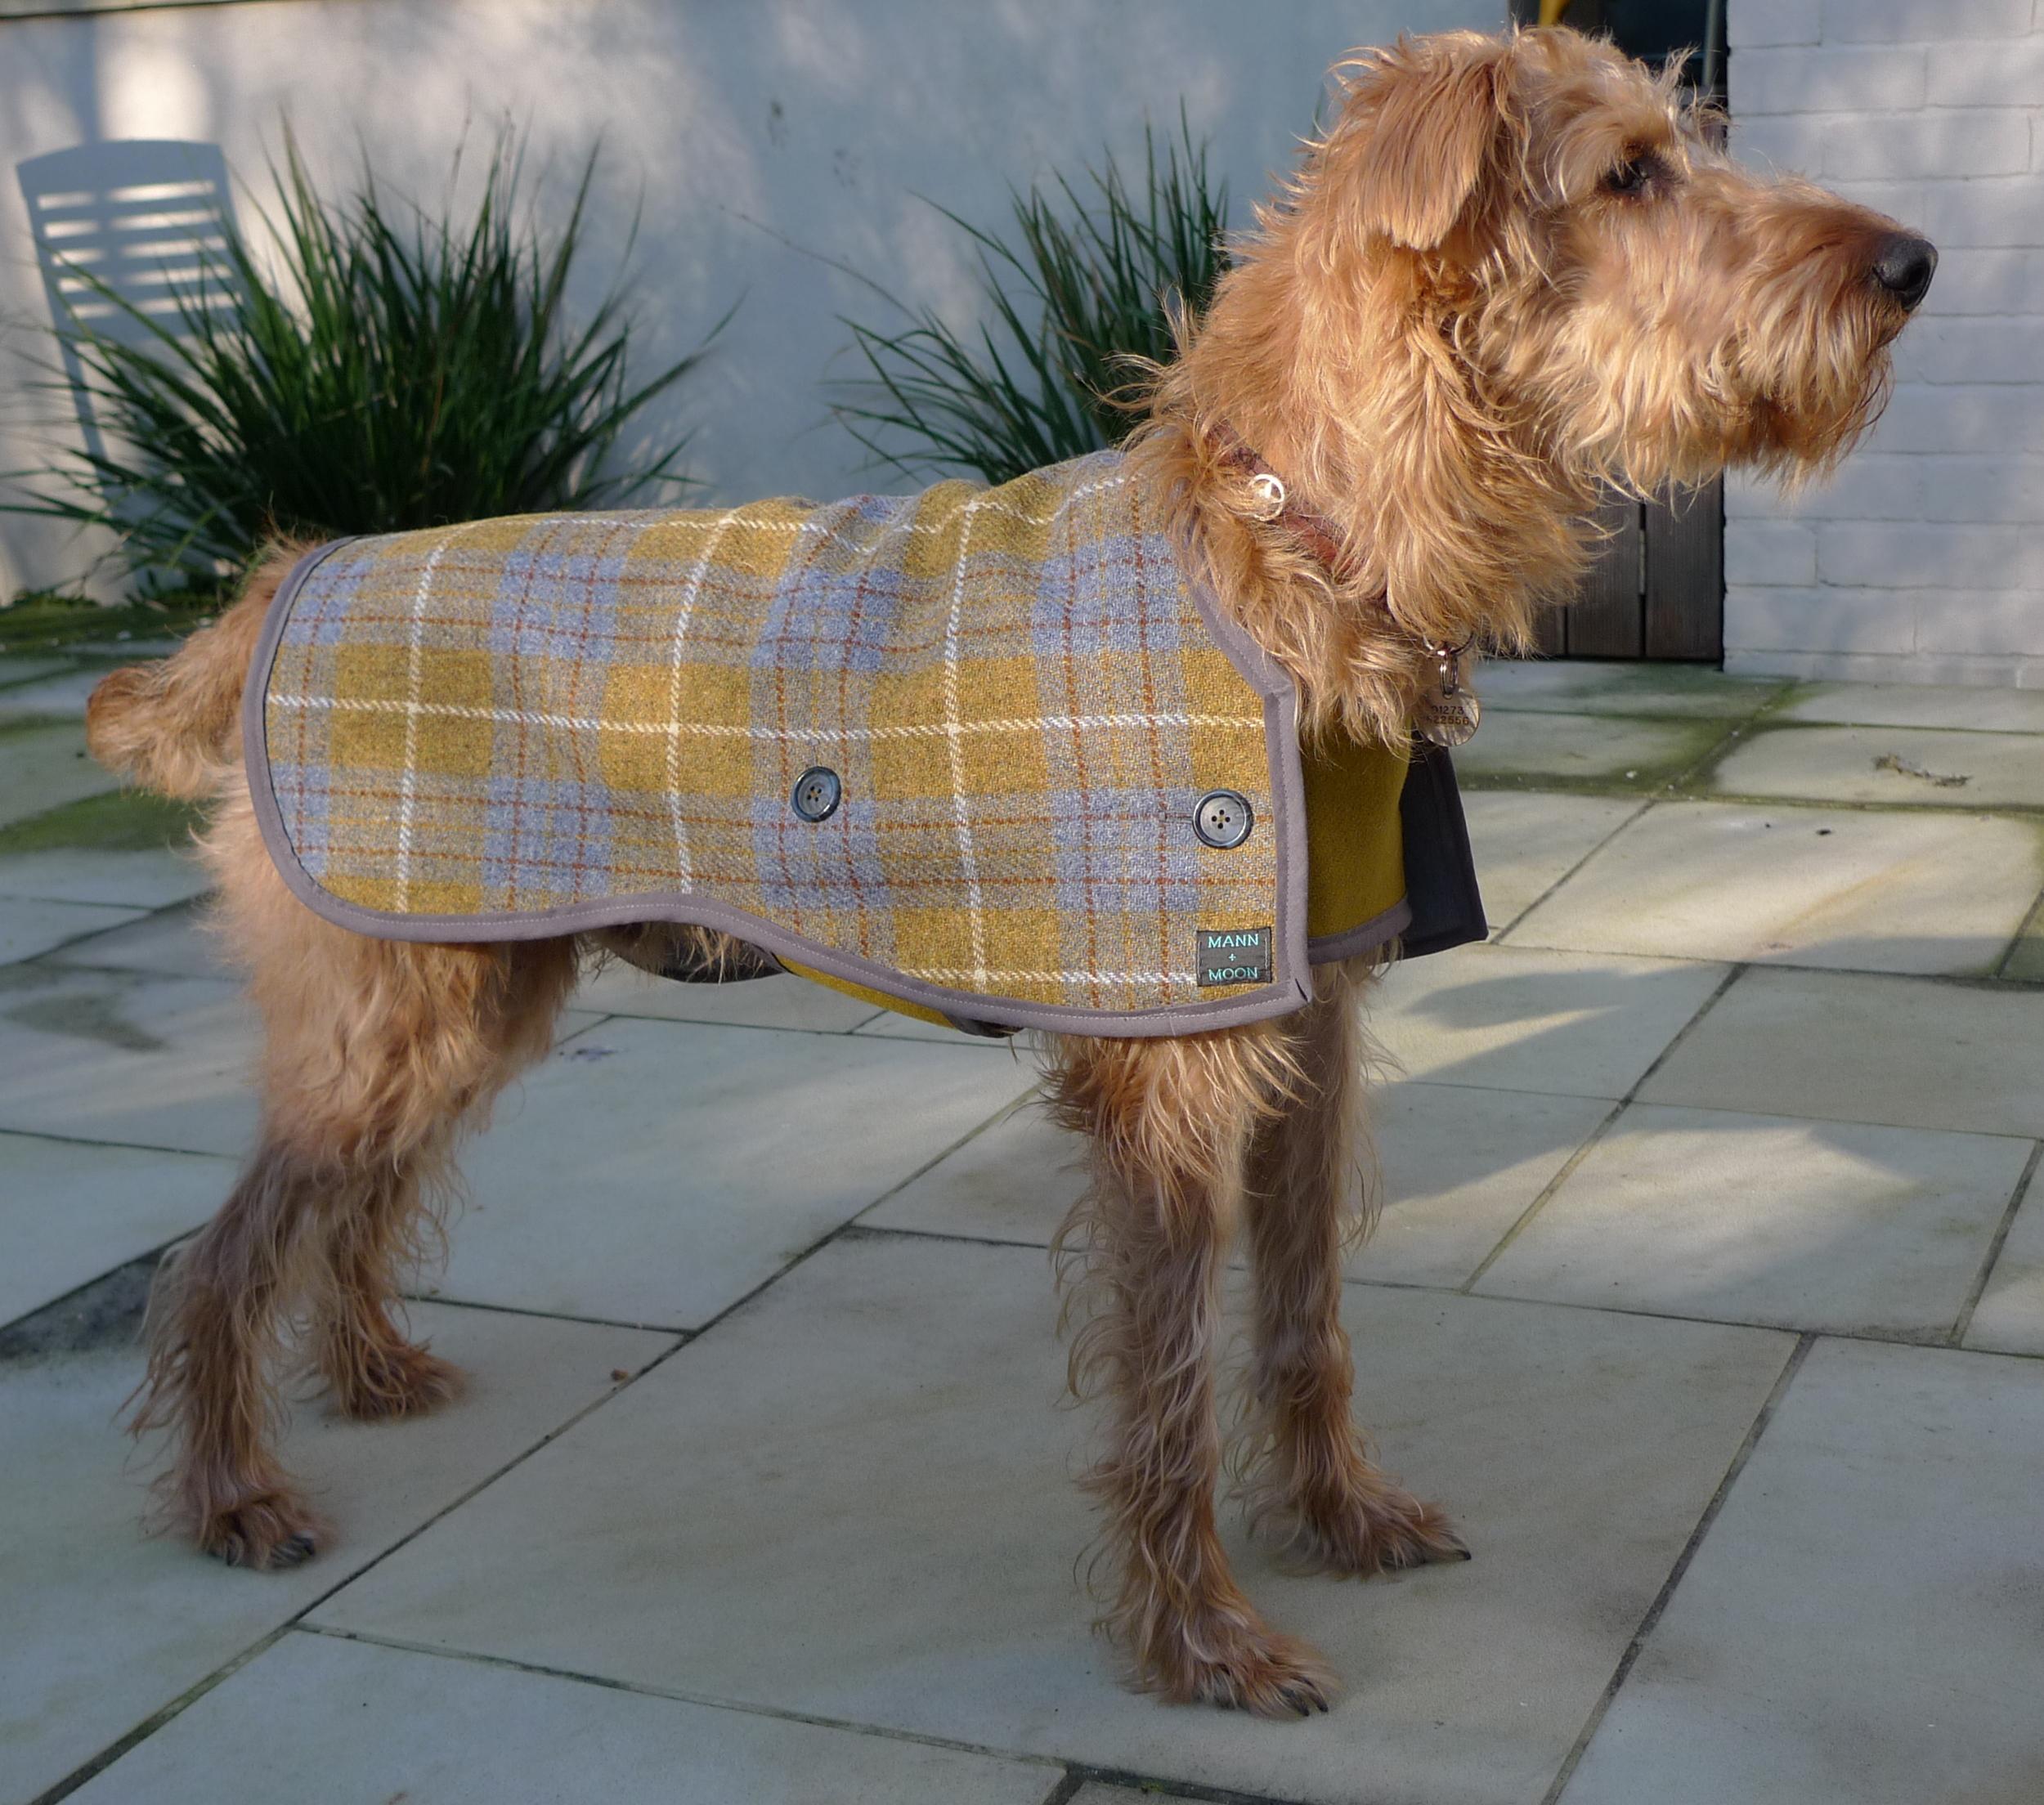 Seamus' perfect posture in his Harris Tweed 2-strap design dog coat